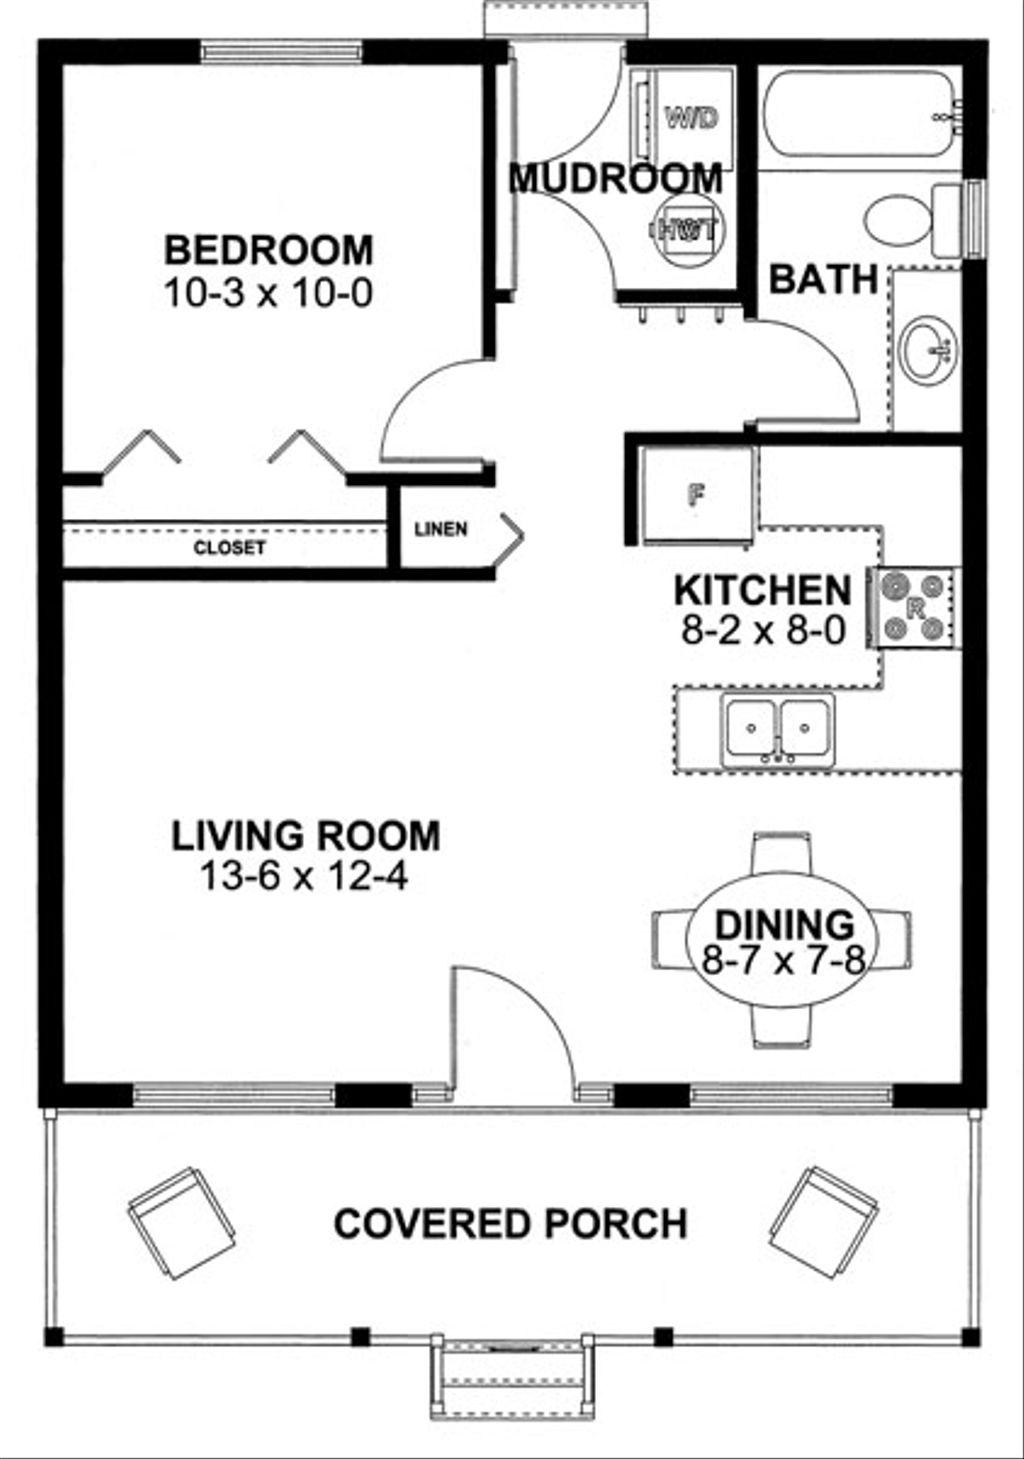 Cabin Style House Plan 1 Beds 1 Baths 598 Sq Ft Plan 126 149 Floorplans Com